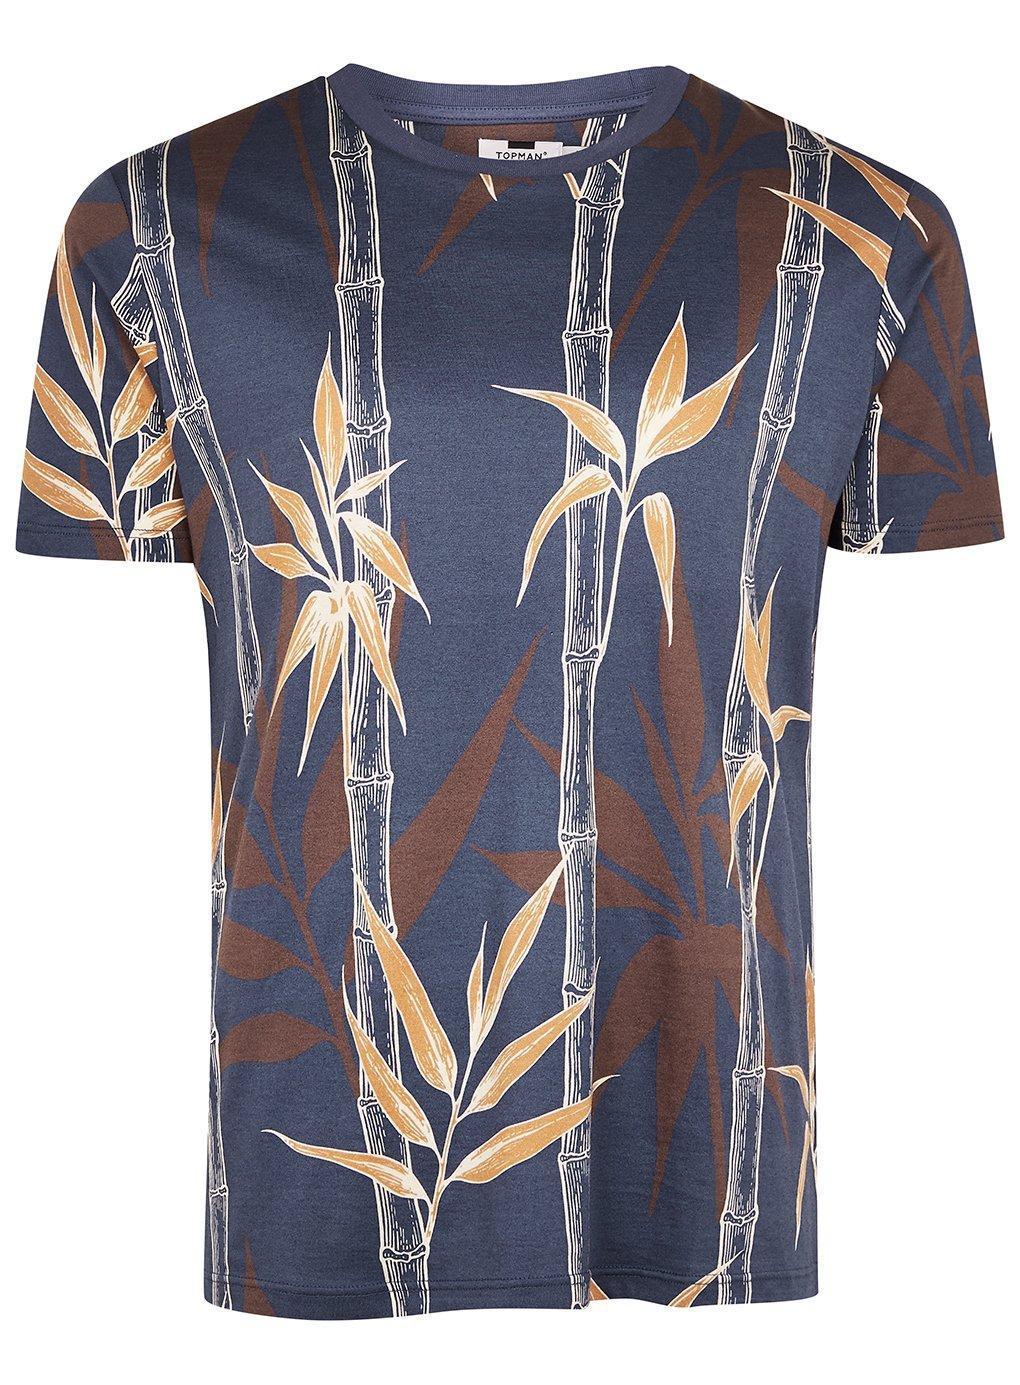 839dad43 Topman - Blue Floral Print T-shirt for Men - Lyst. View fullscreen